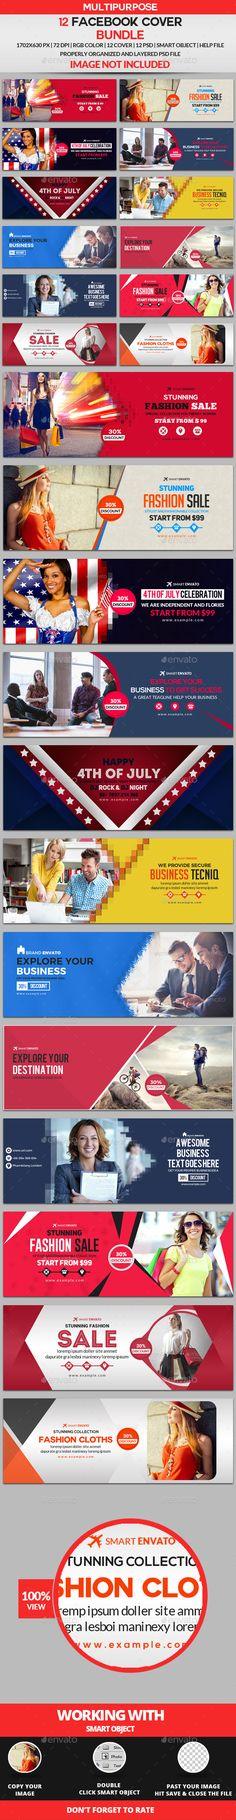 Facebook Cover Templates PSD Bundle - 12 Design